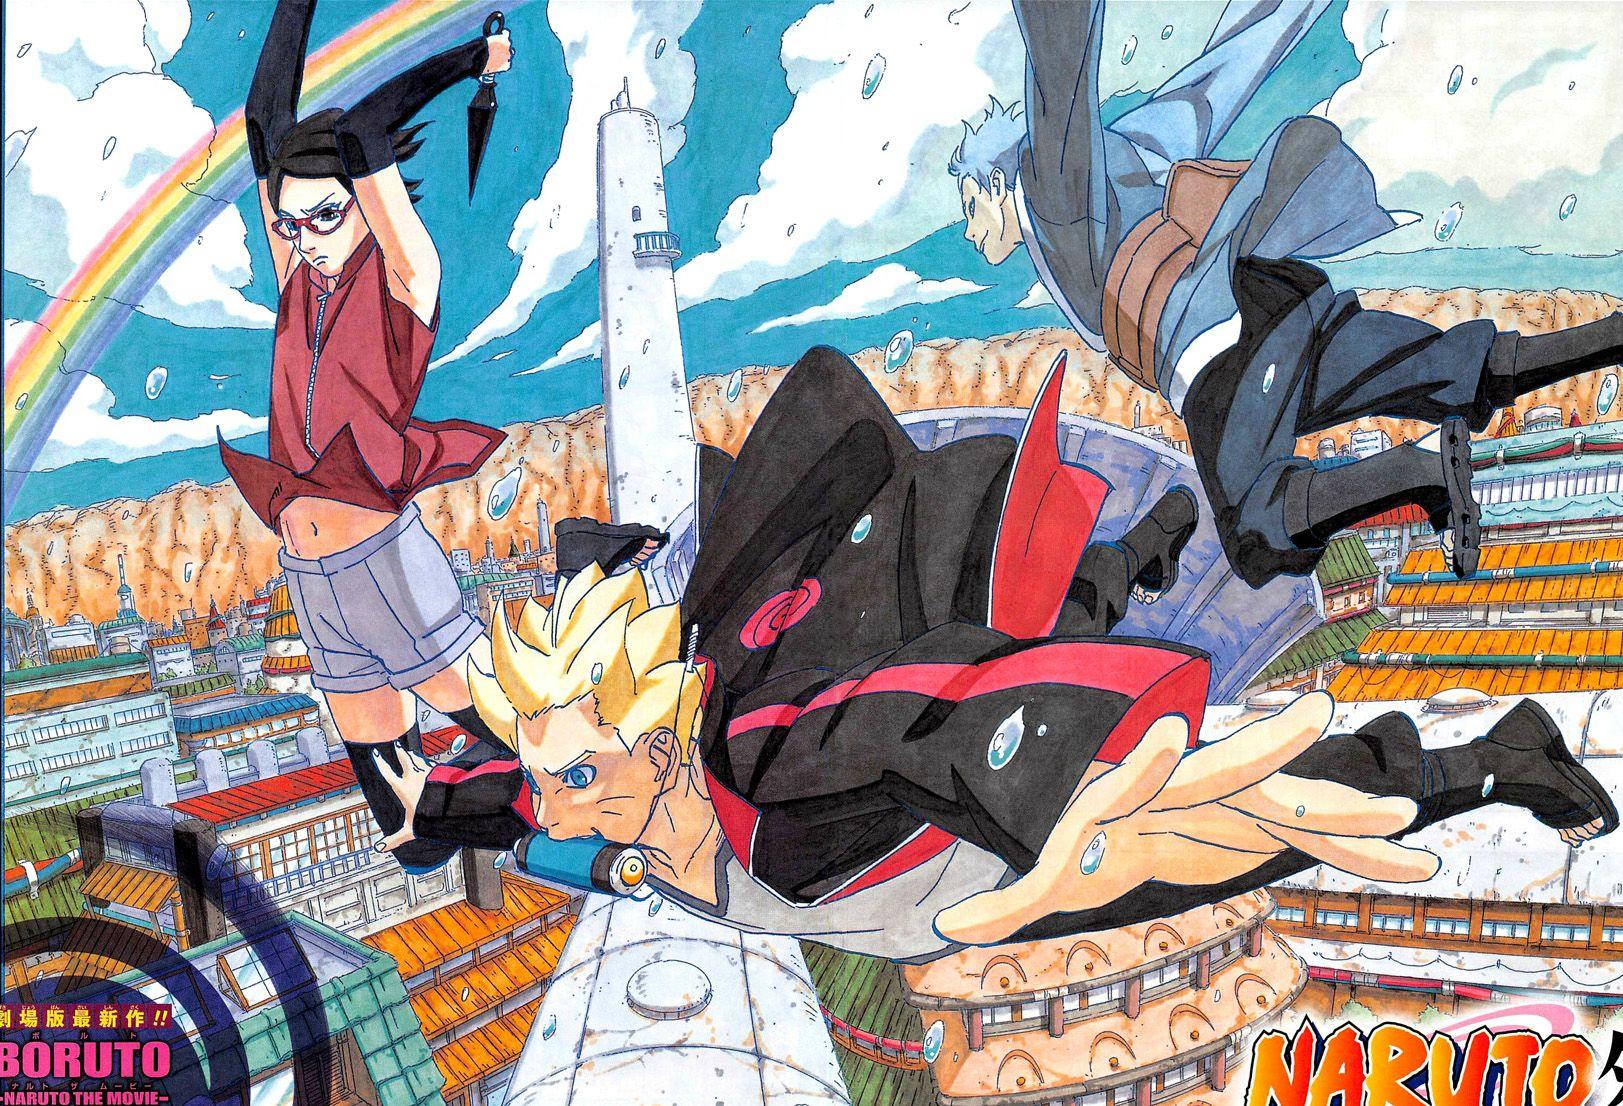 KspeIEf Boruto: Naruto the Movie'un Yeni Fragmanları